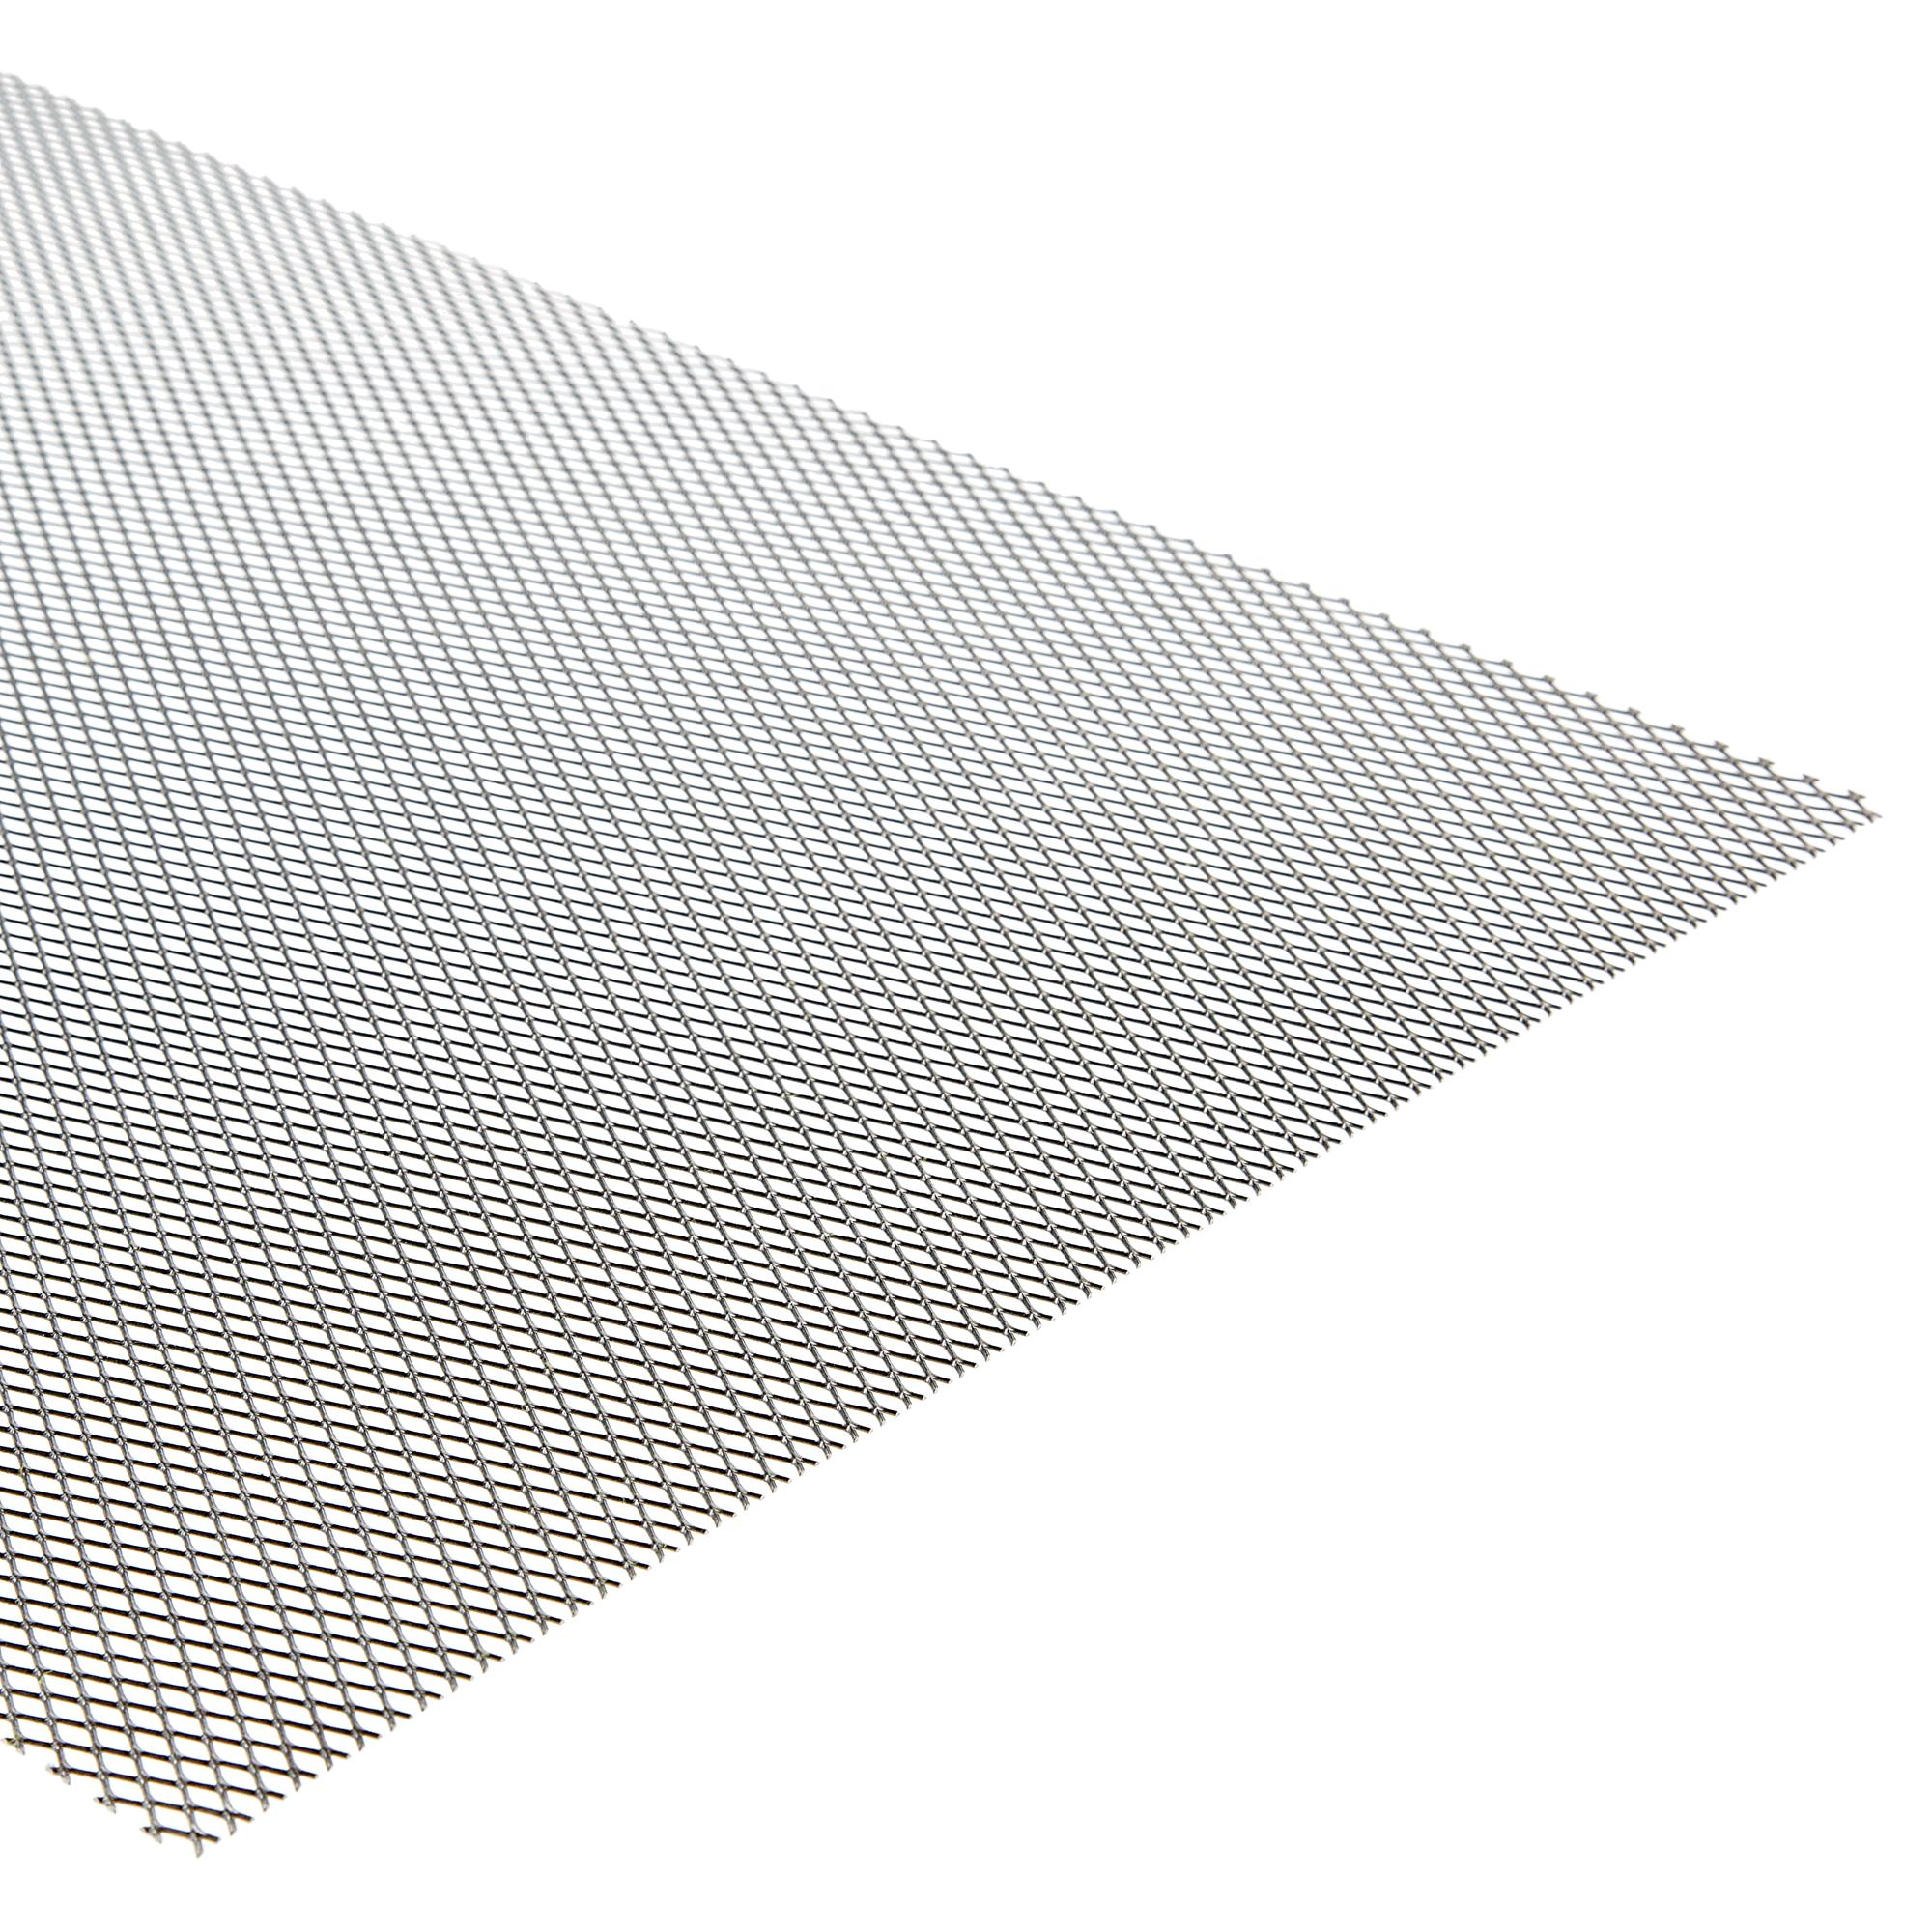 Streckmetall Richtig Anbringen streckmetall richtig anbringen hubhausdesign co